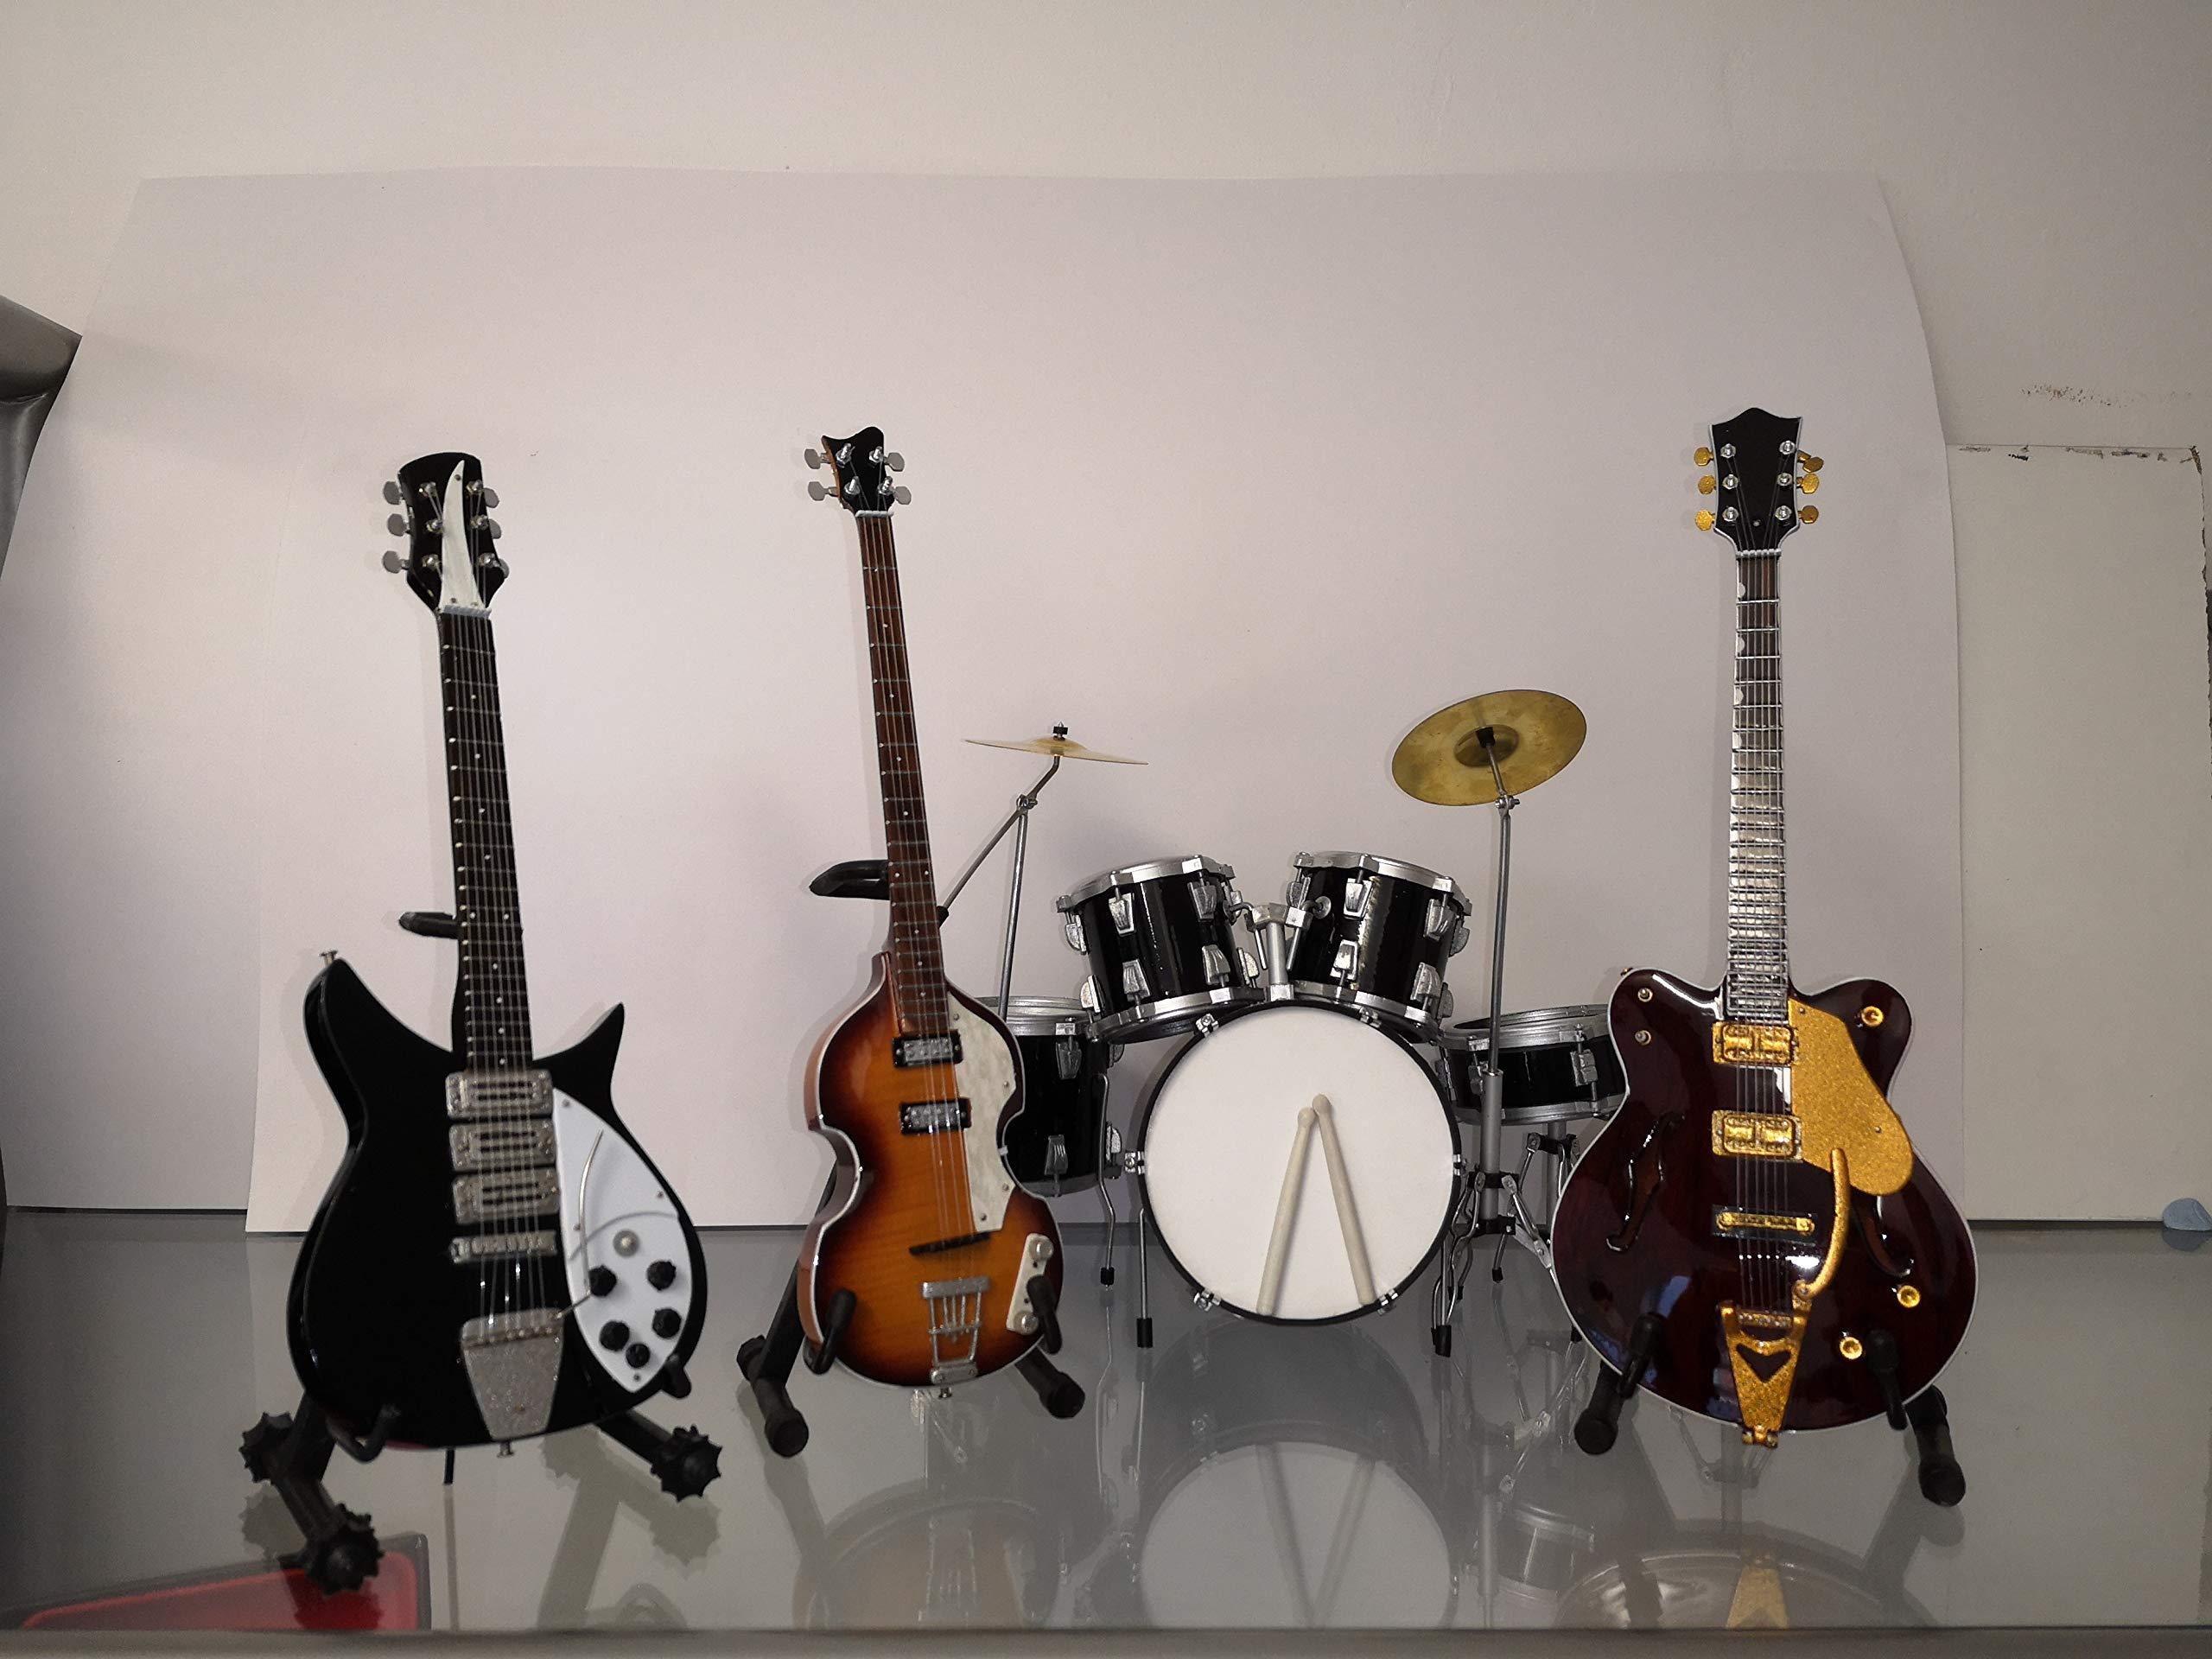 Miniatura Guitarra Replica Set: The Beatles: Amazon.es ...